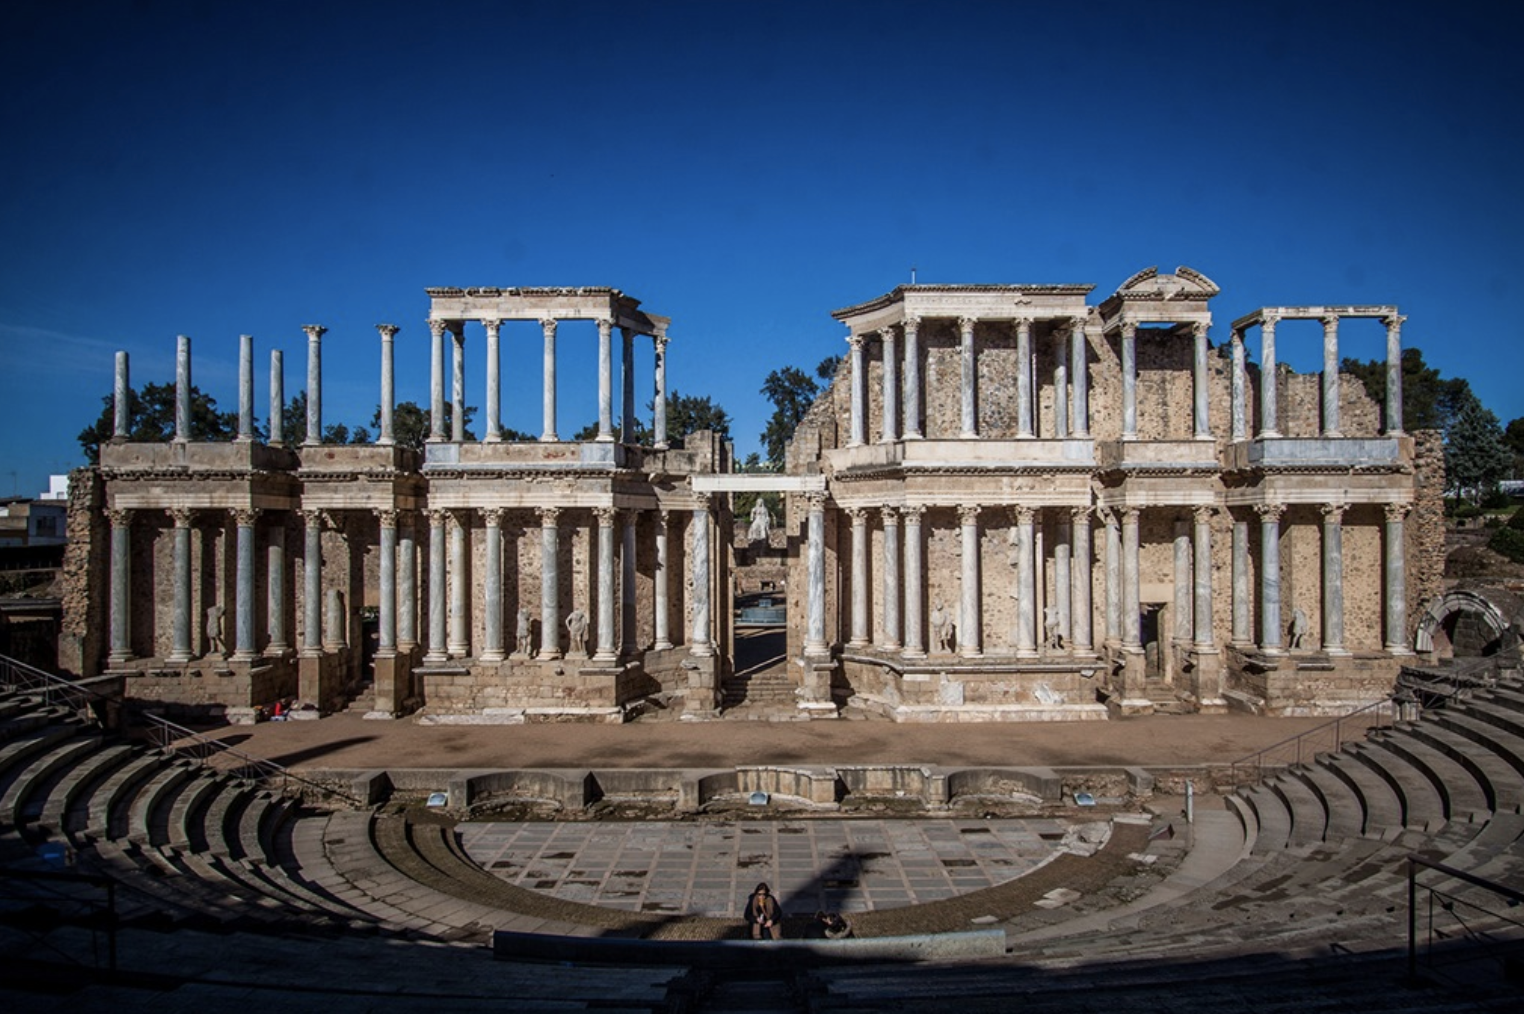 Teatro romano, Mérida